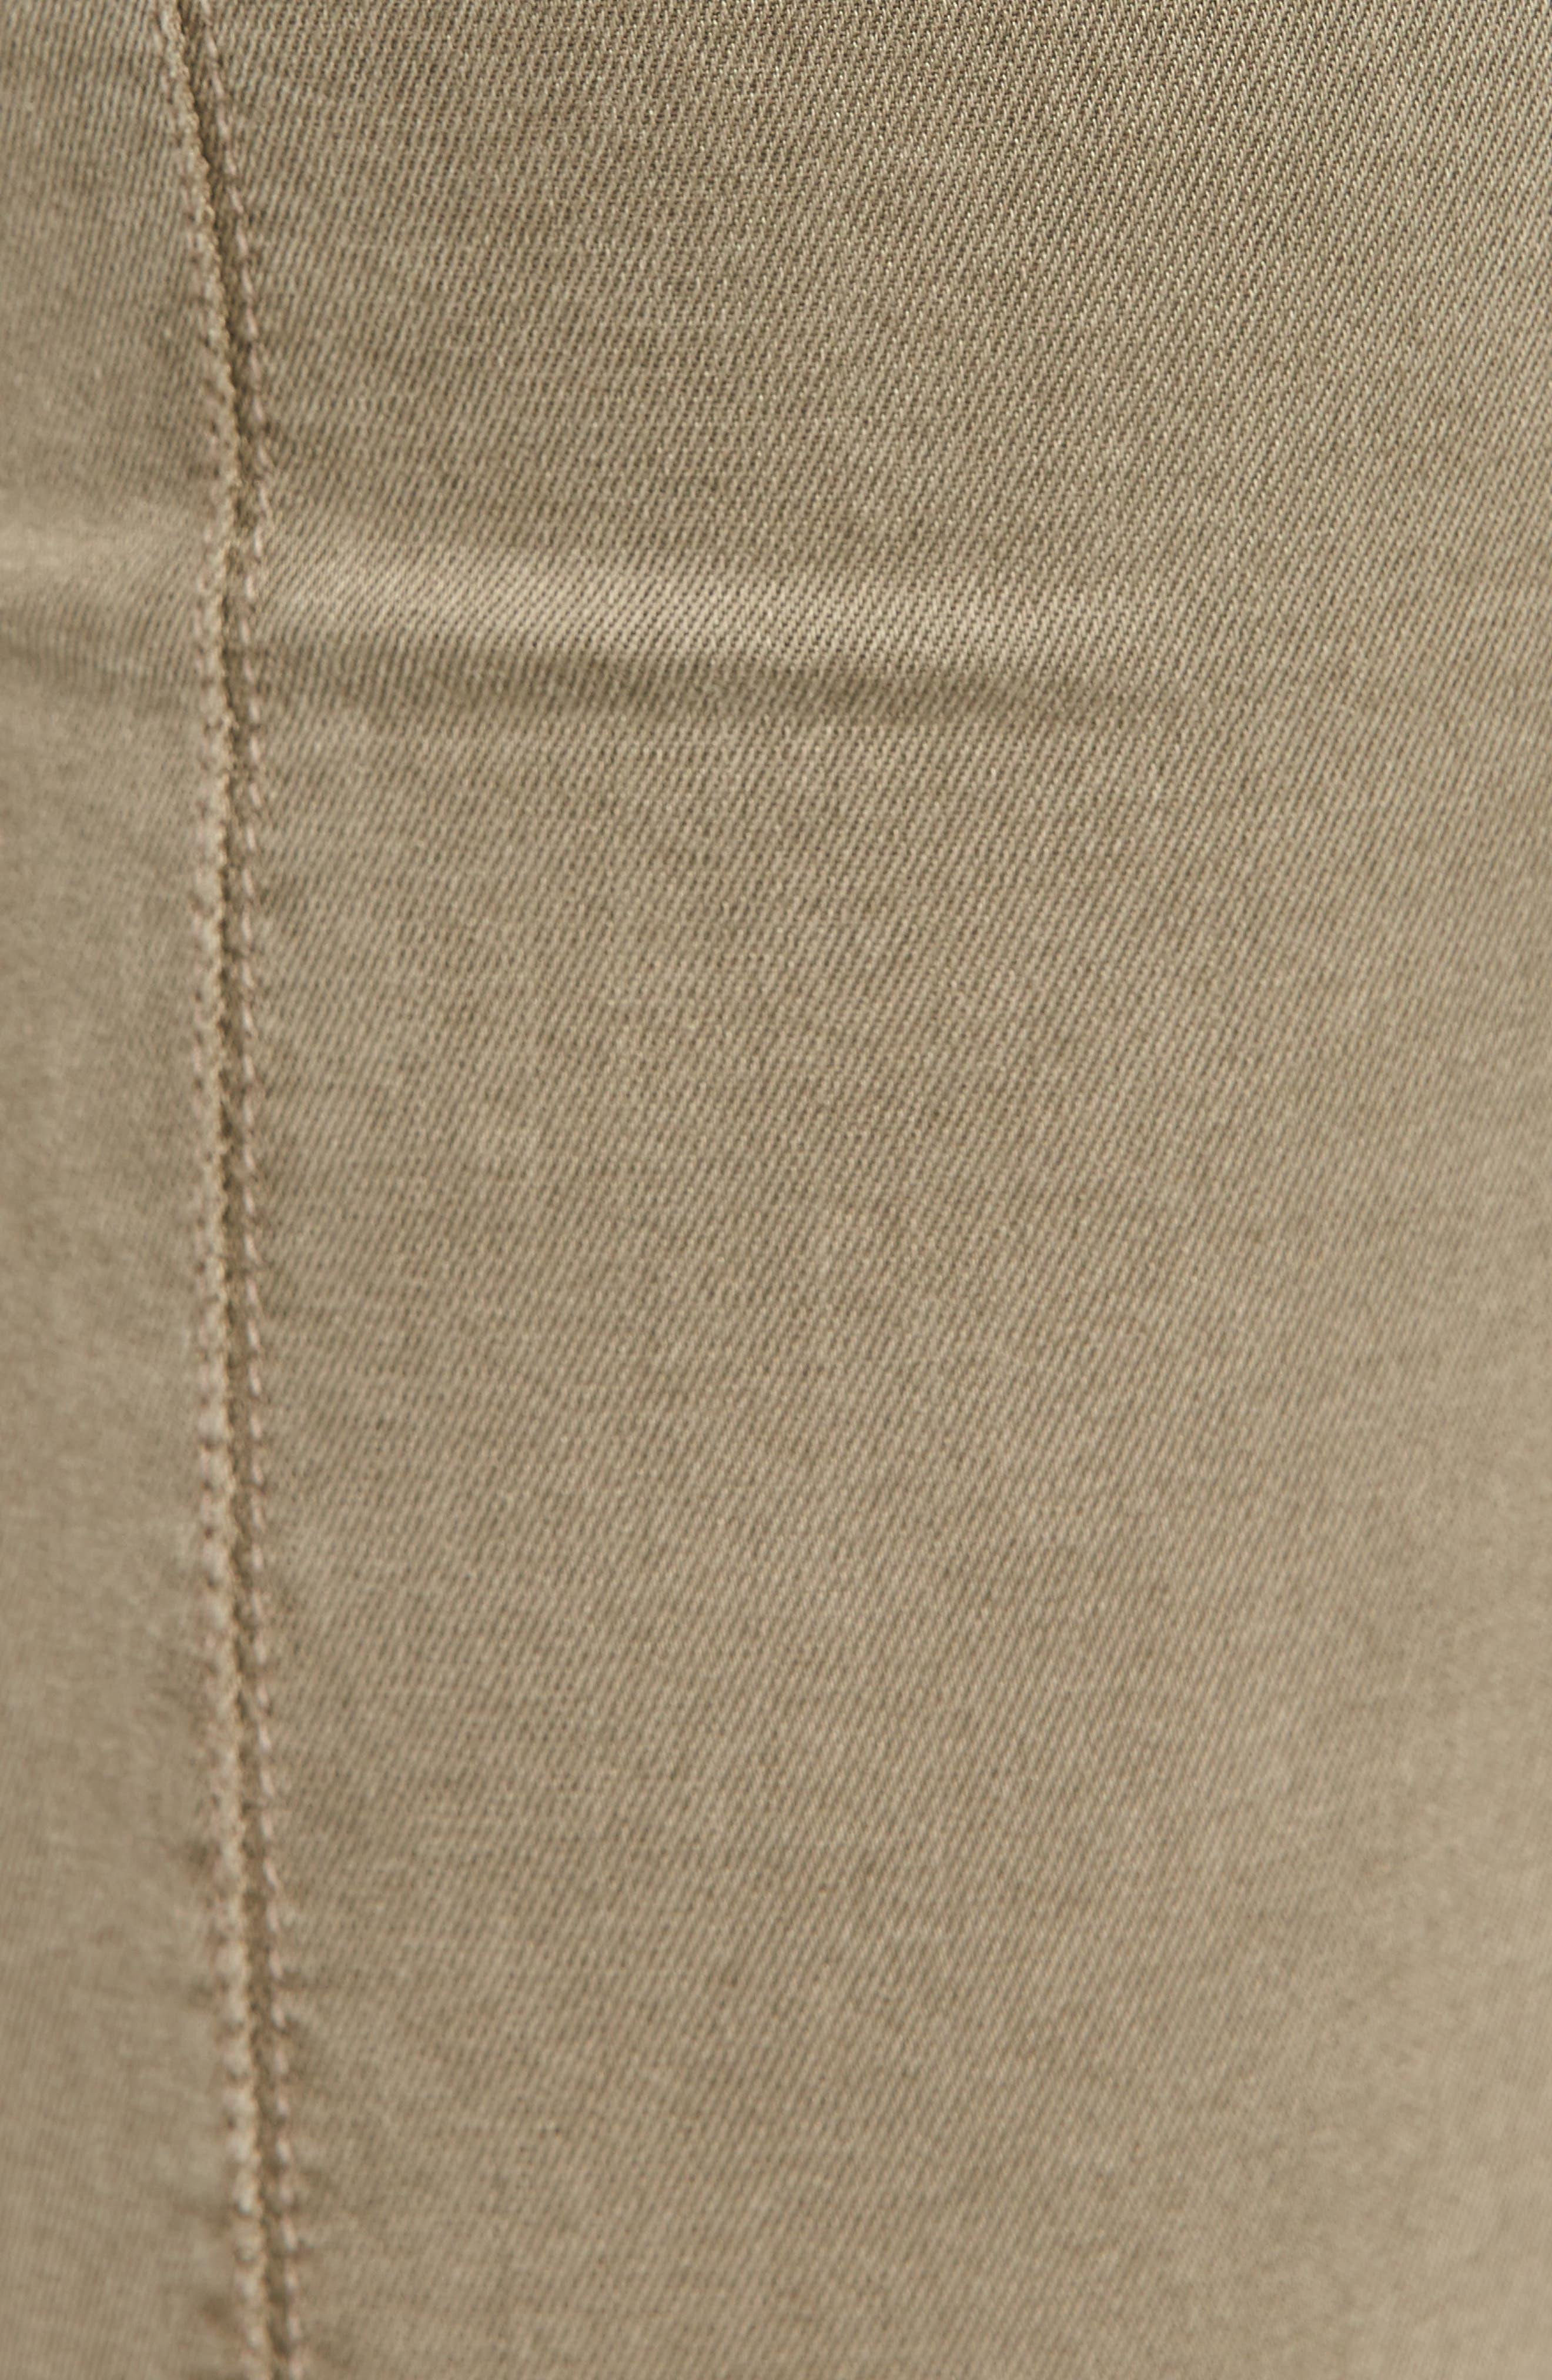 Skinny Utility Pants,                             Alternate thumbnail 6, color,                             300